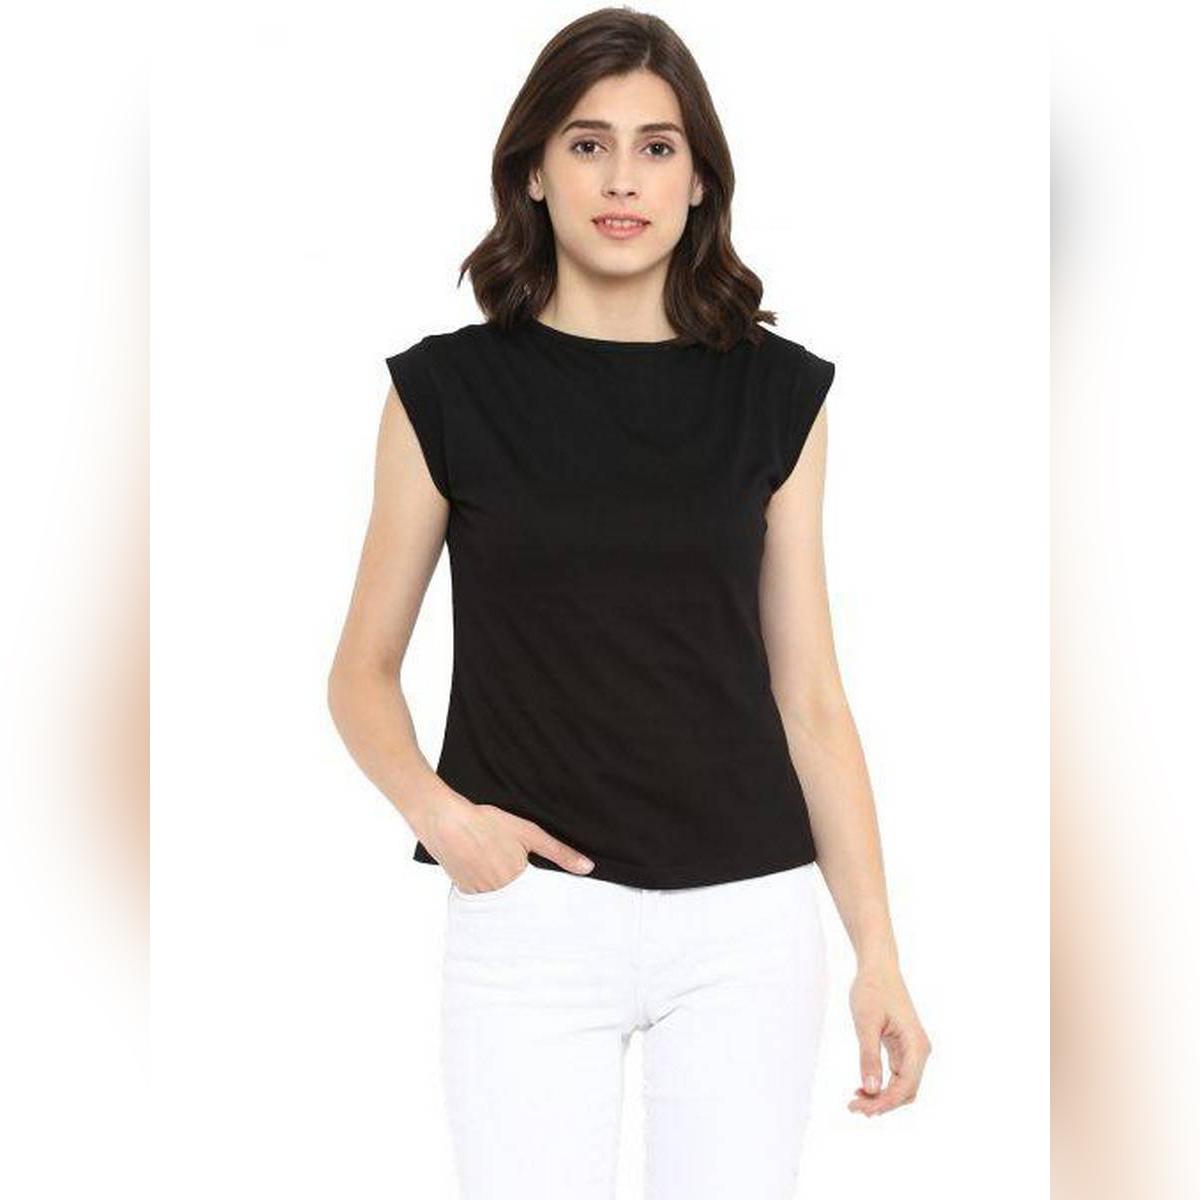 AL FAJAR Cap Sleeves Sleeveless Half Sleeves Cotton Stylish Tshirt T-Shirt T Shirt Top For Women For Girls